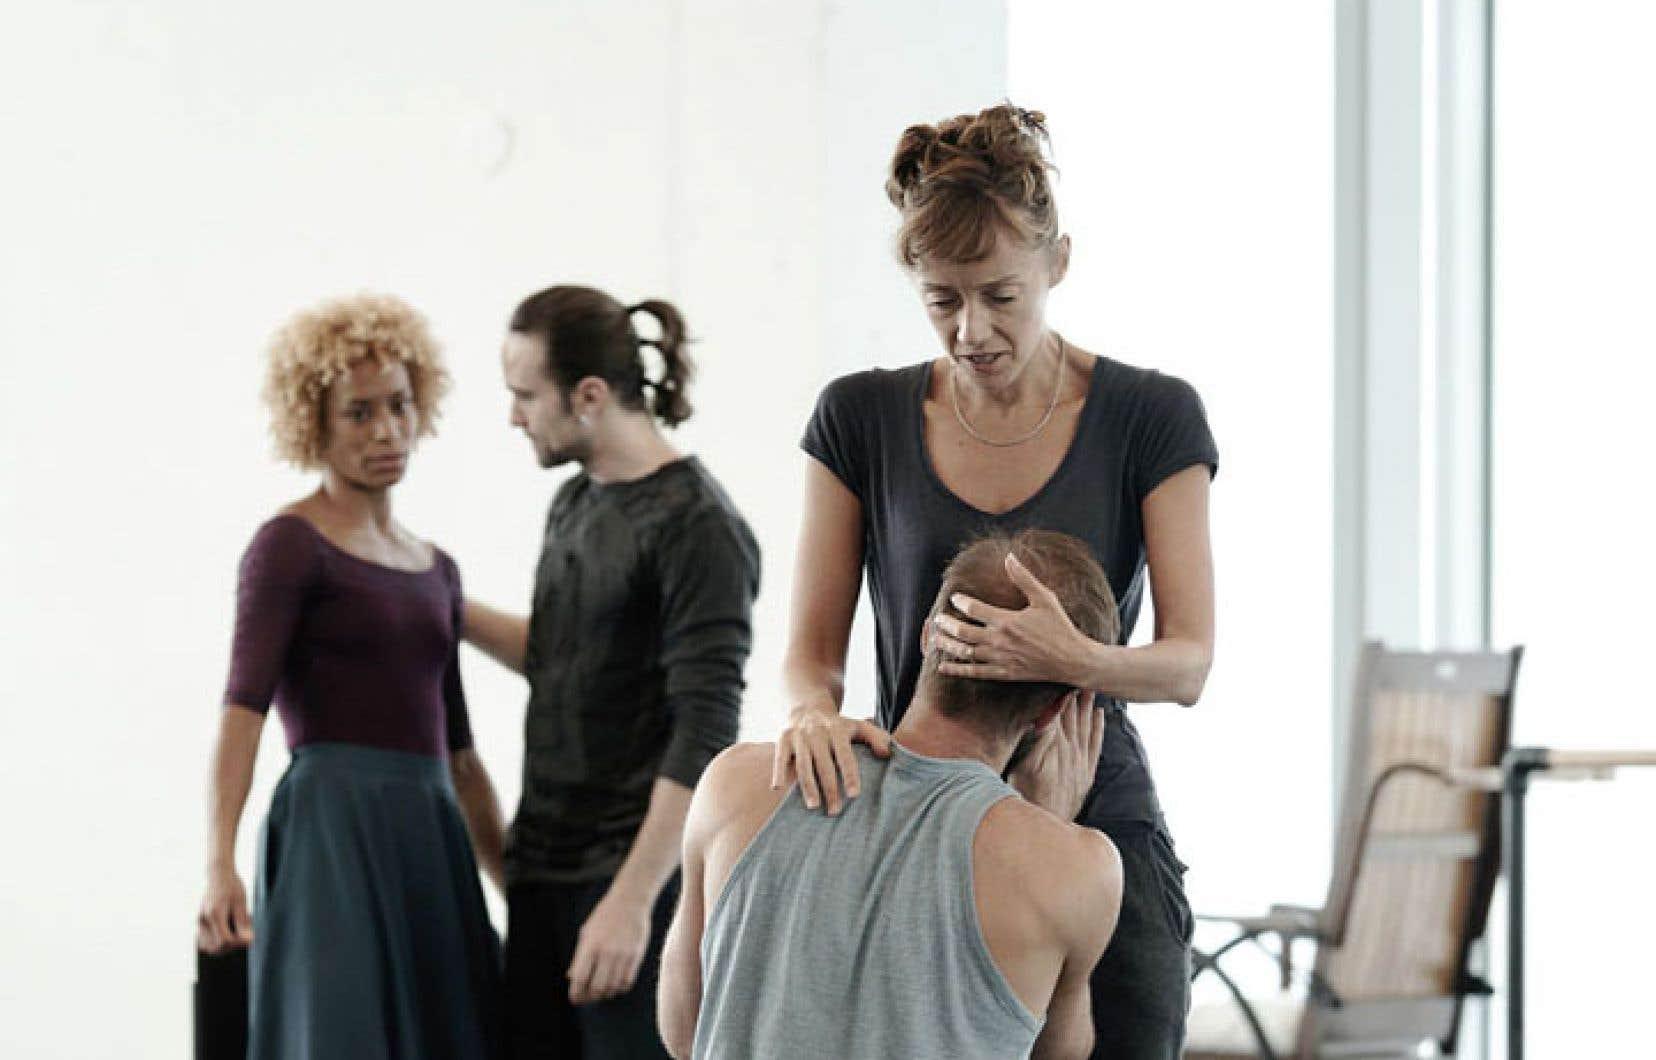 Vanesa Garcia-Ribala Montoya (Connie), Jean-Sébastien Couture (Oliver), Cathy Marston et Raphaël Bouchard (Oliver) en répétition